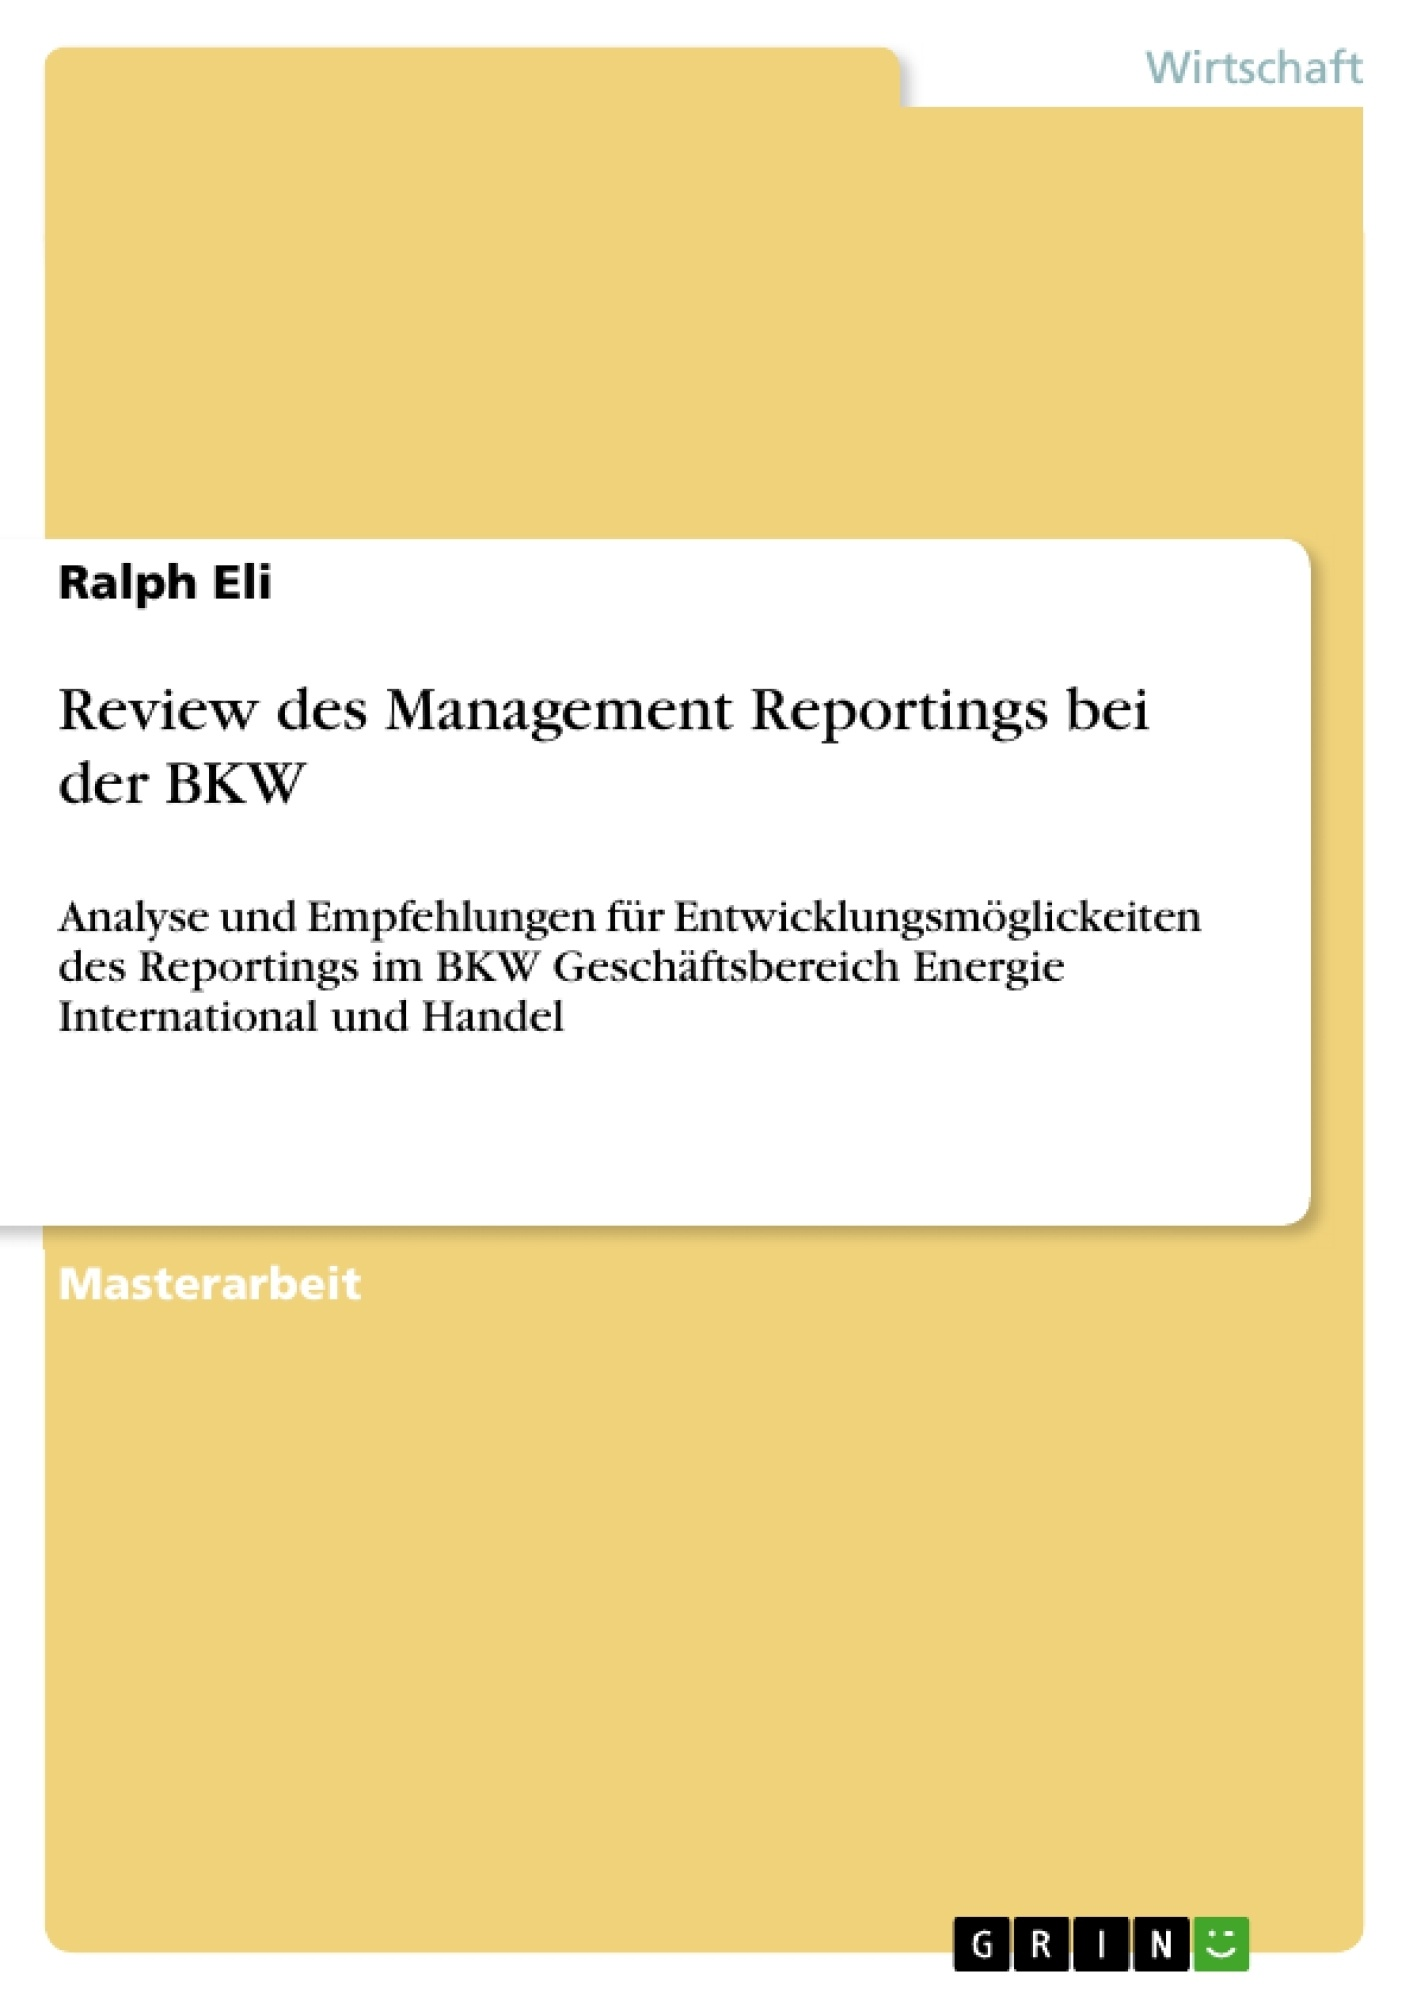 Review Des Management Reportings Bei Der Bkw Masterarbeit